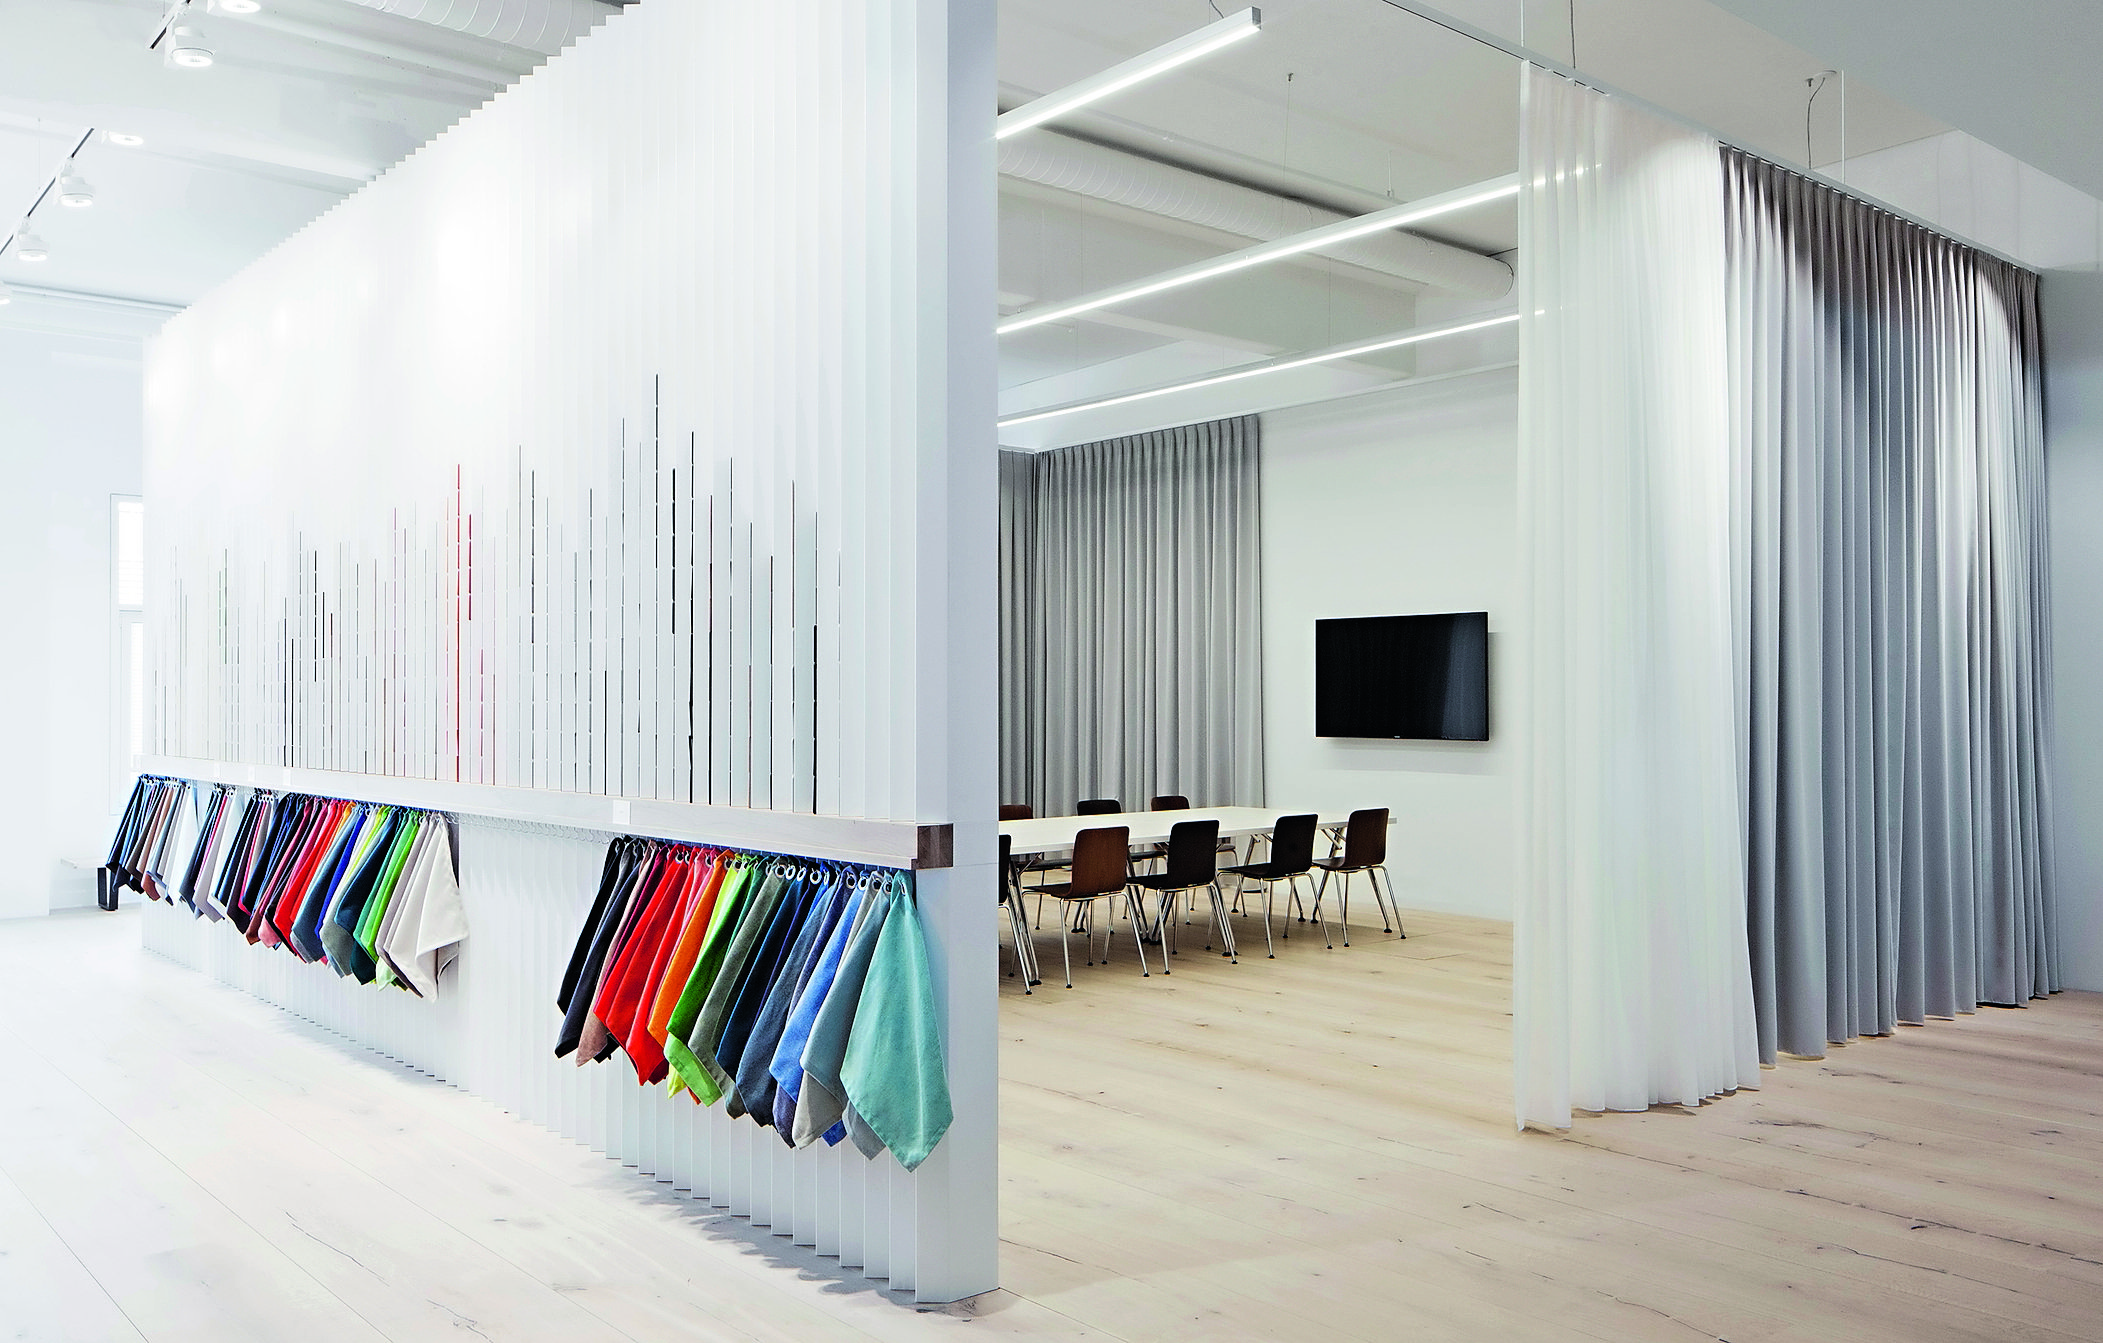 projekt vitra workspace von cr ation baumann. Black Bedroom Furniture Sets. Home Design Ideas